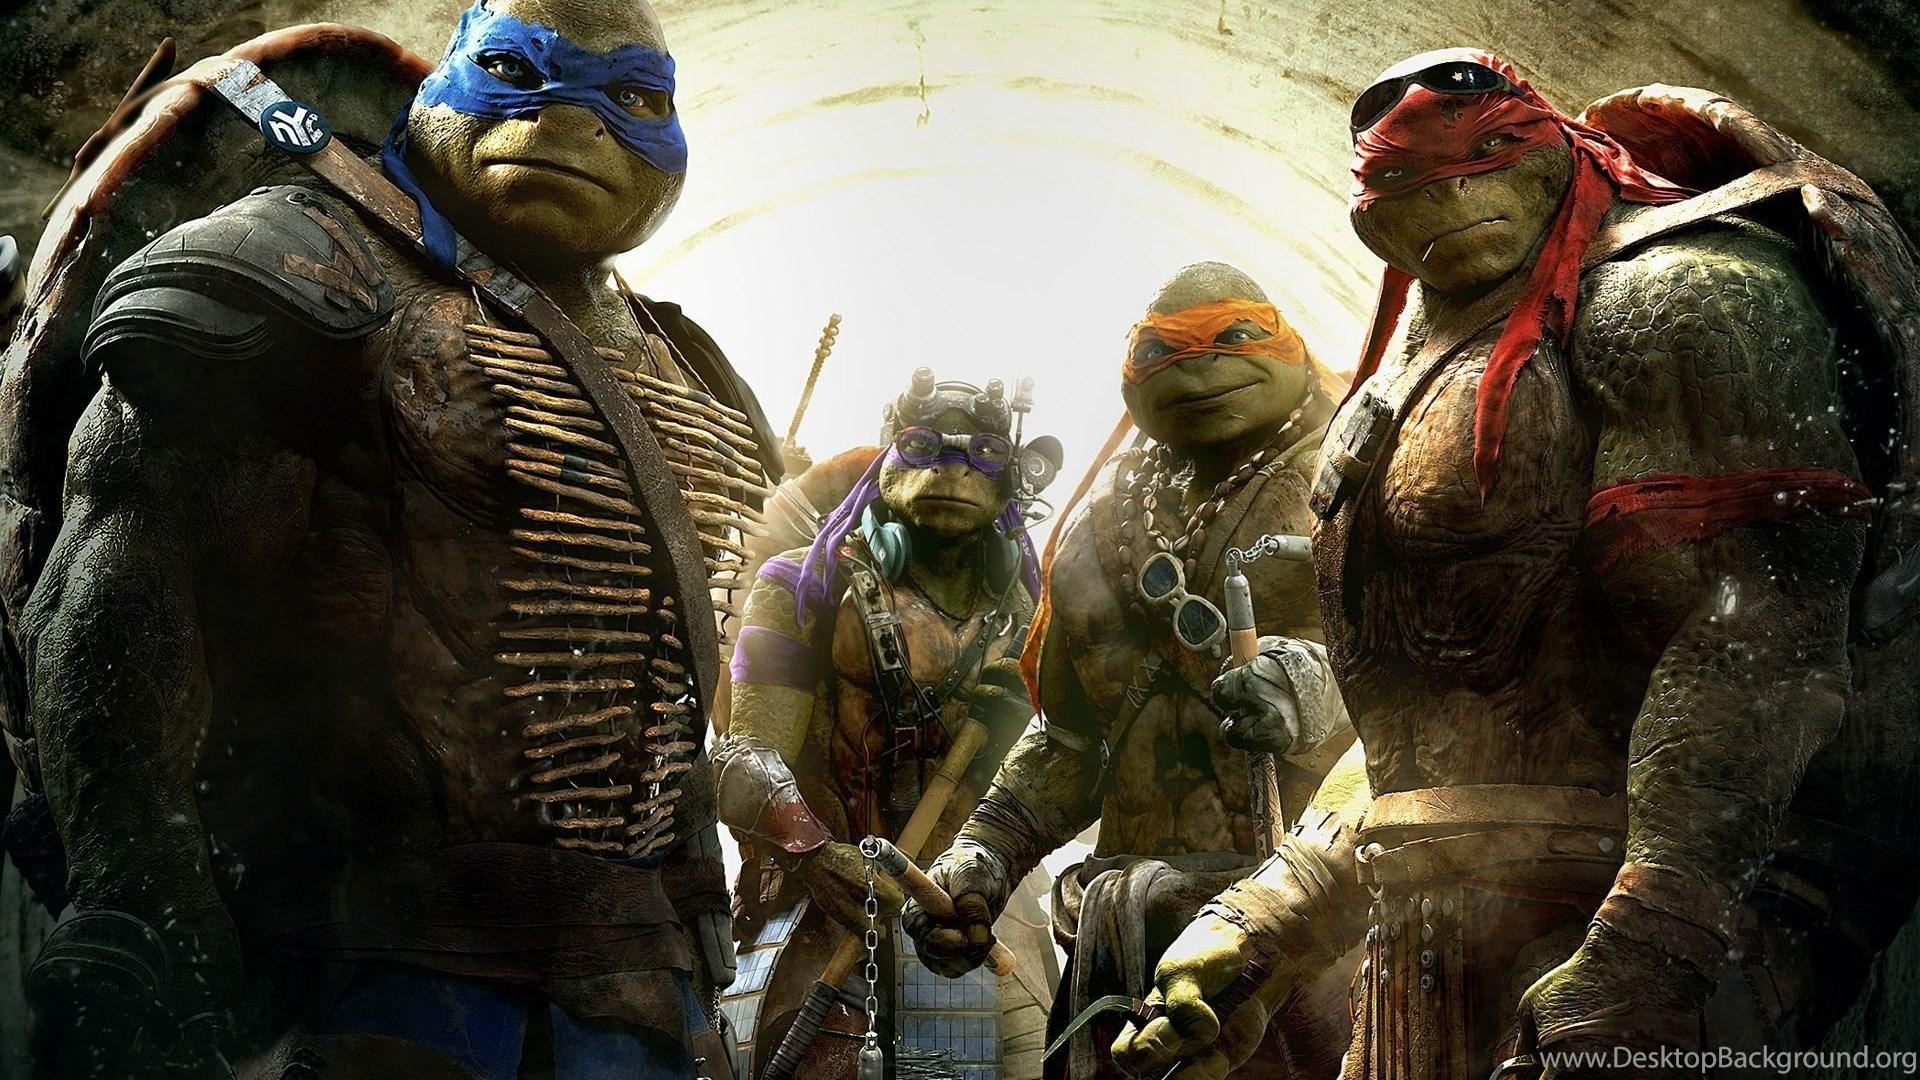 Teenage Mutant Ninja Turtles 2014 Wallpapers Desktop Background